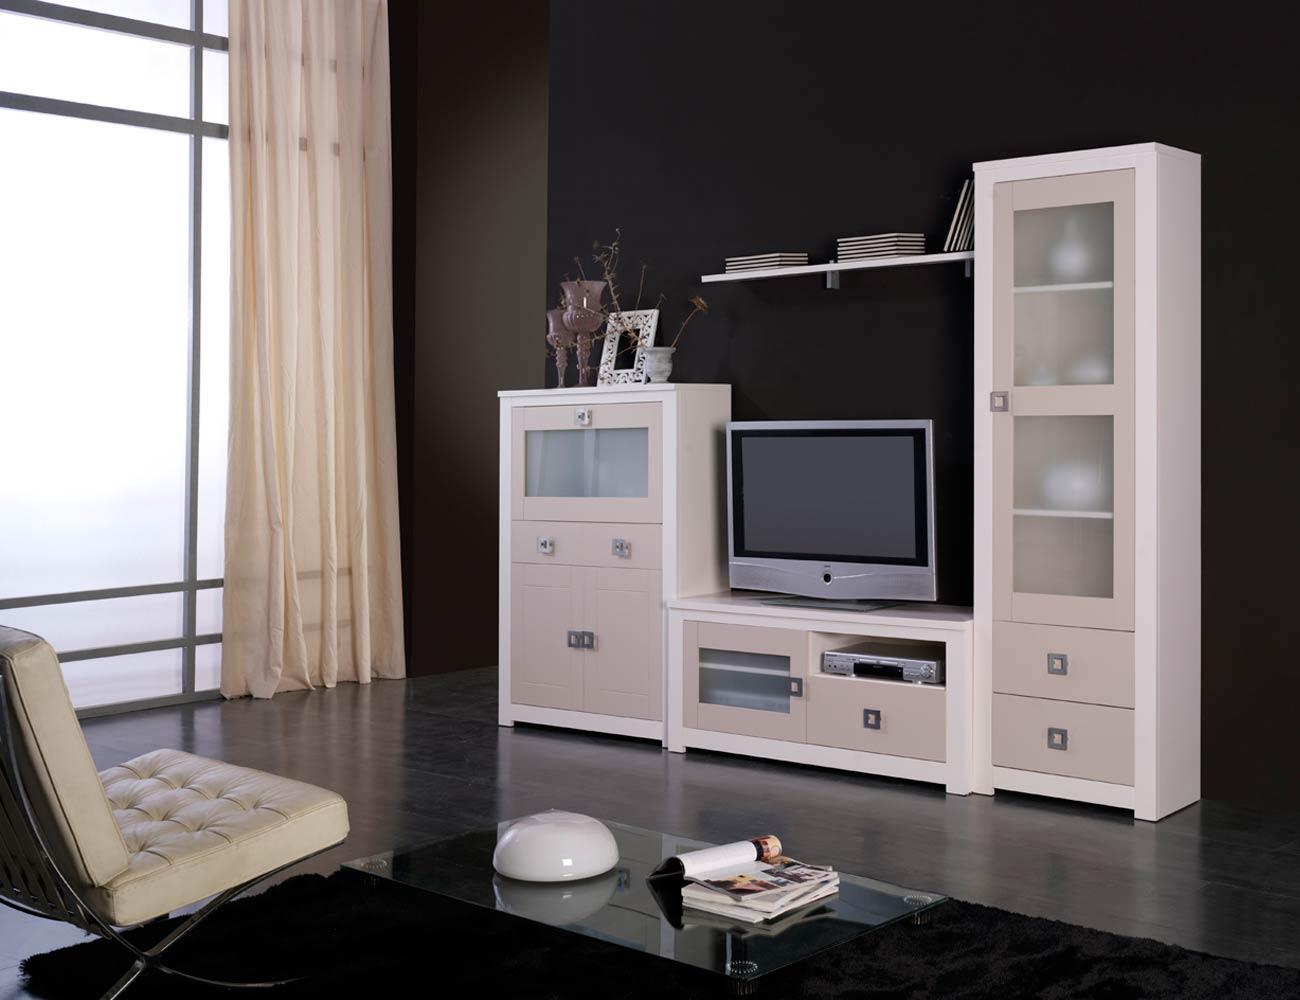 Mueble salon modular lacado blanco piedra madera dm1